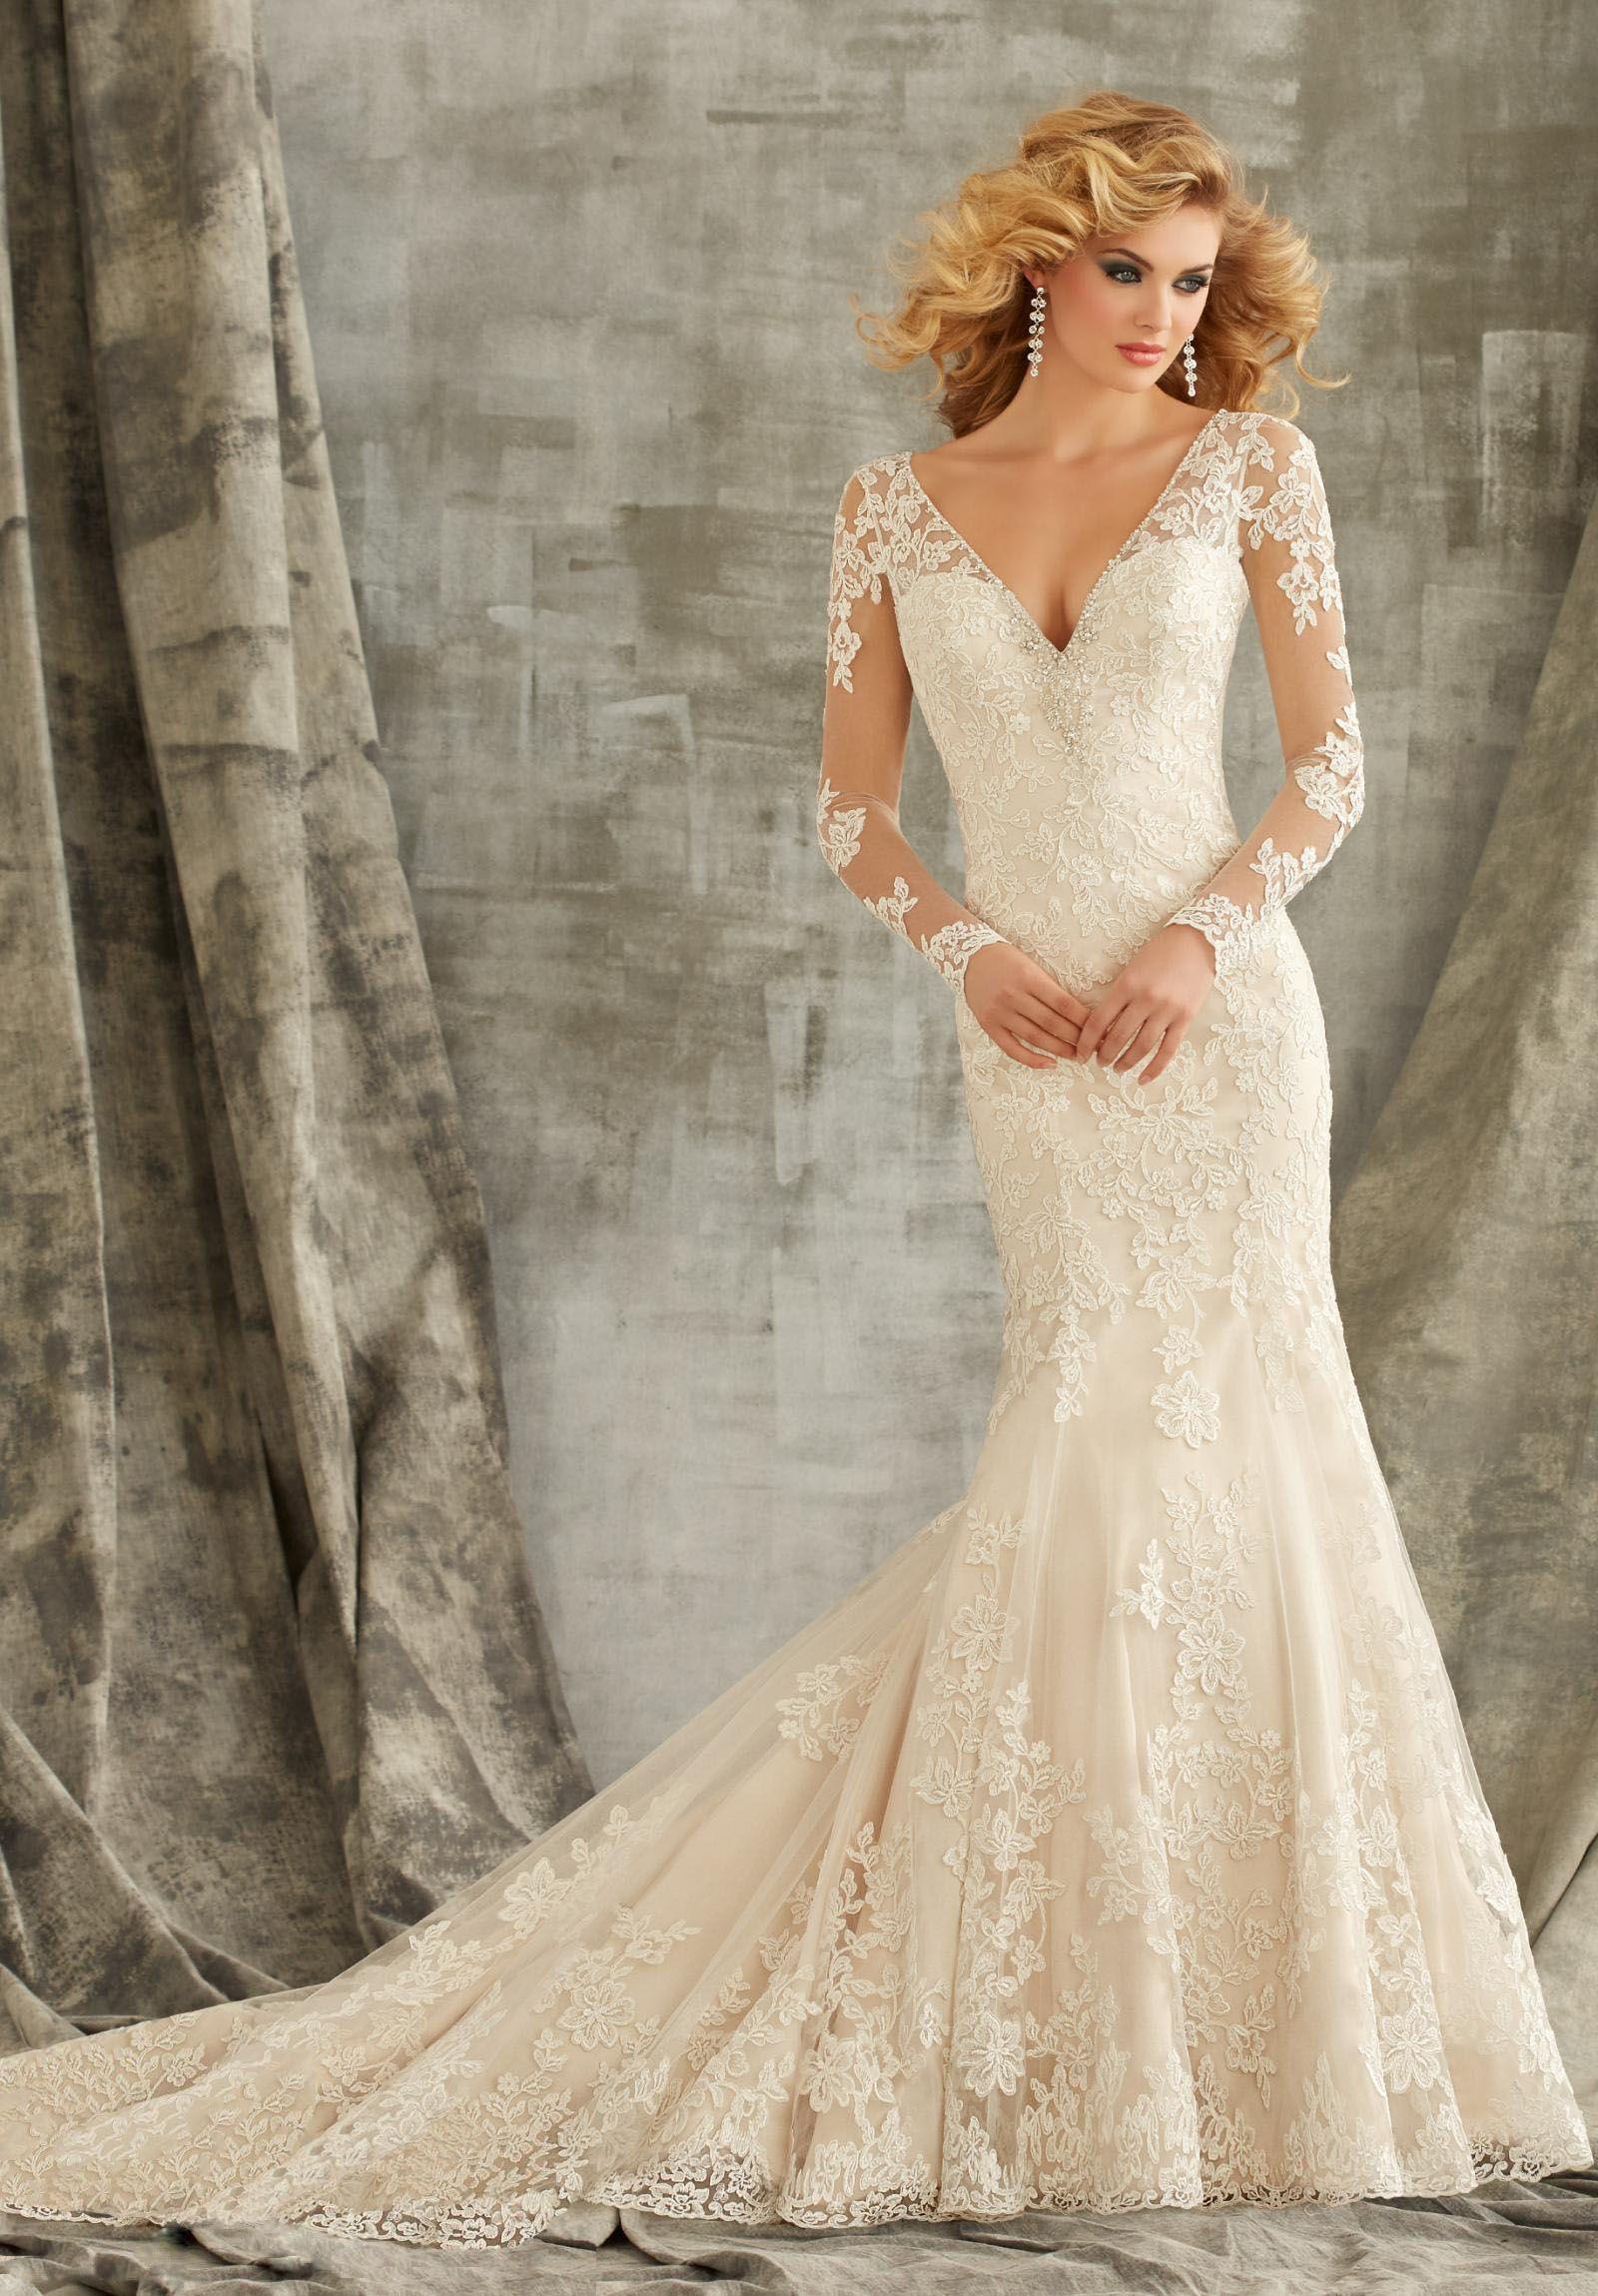 Custom long sleeve wedding dresses long sleeve wedding dresses